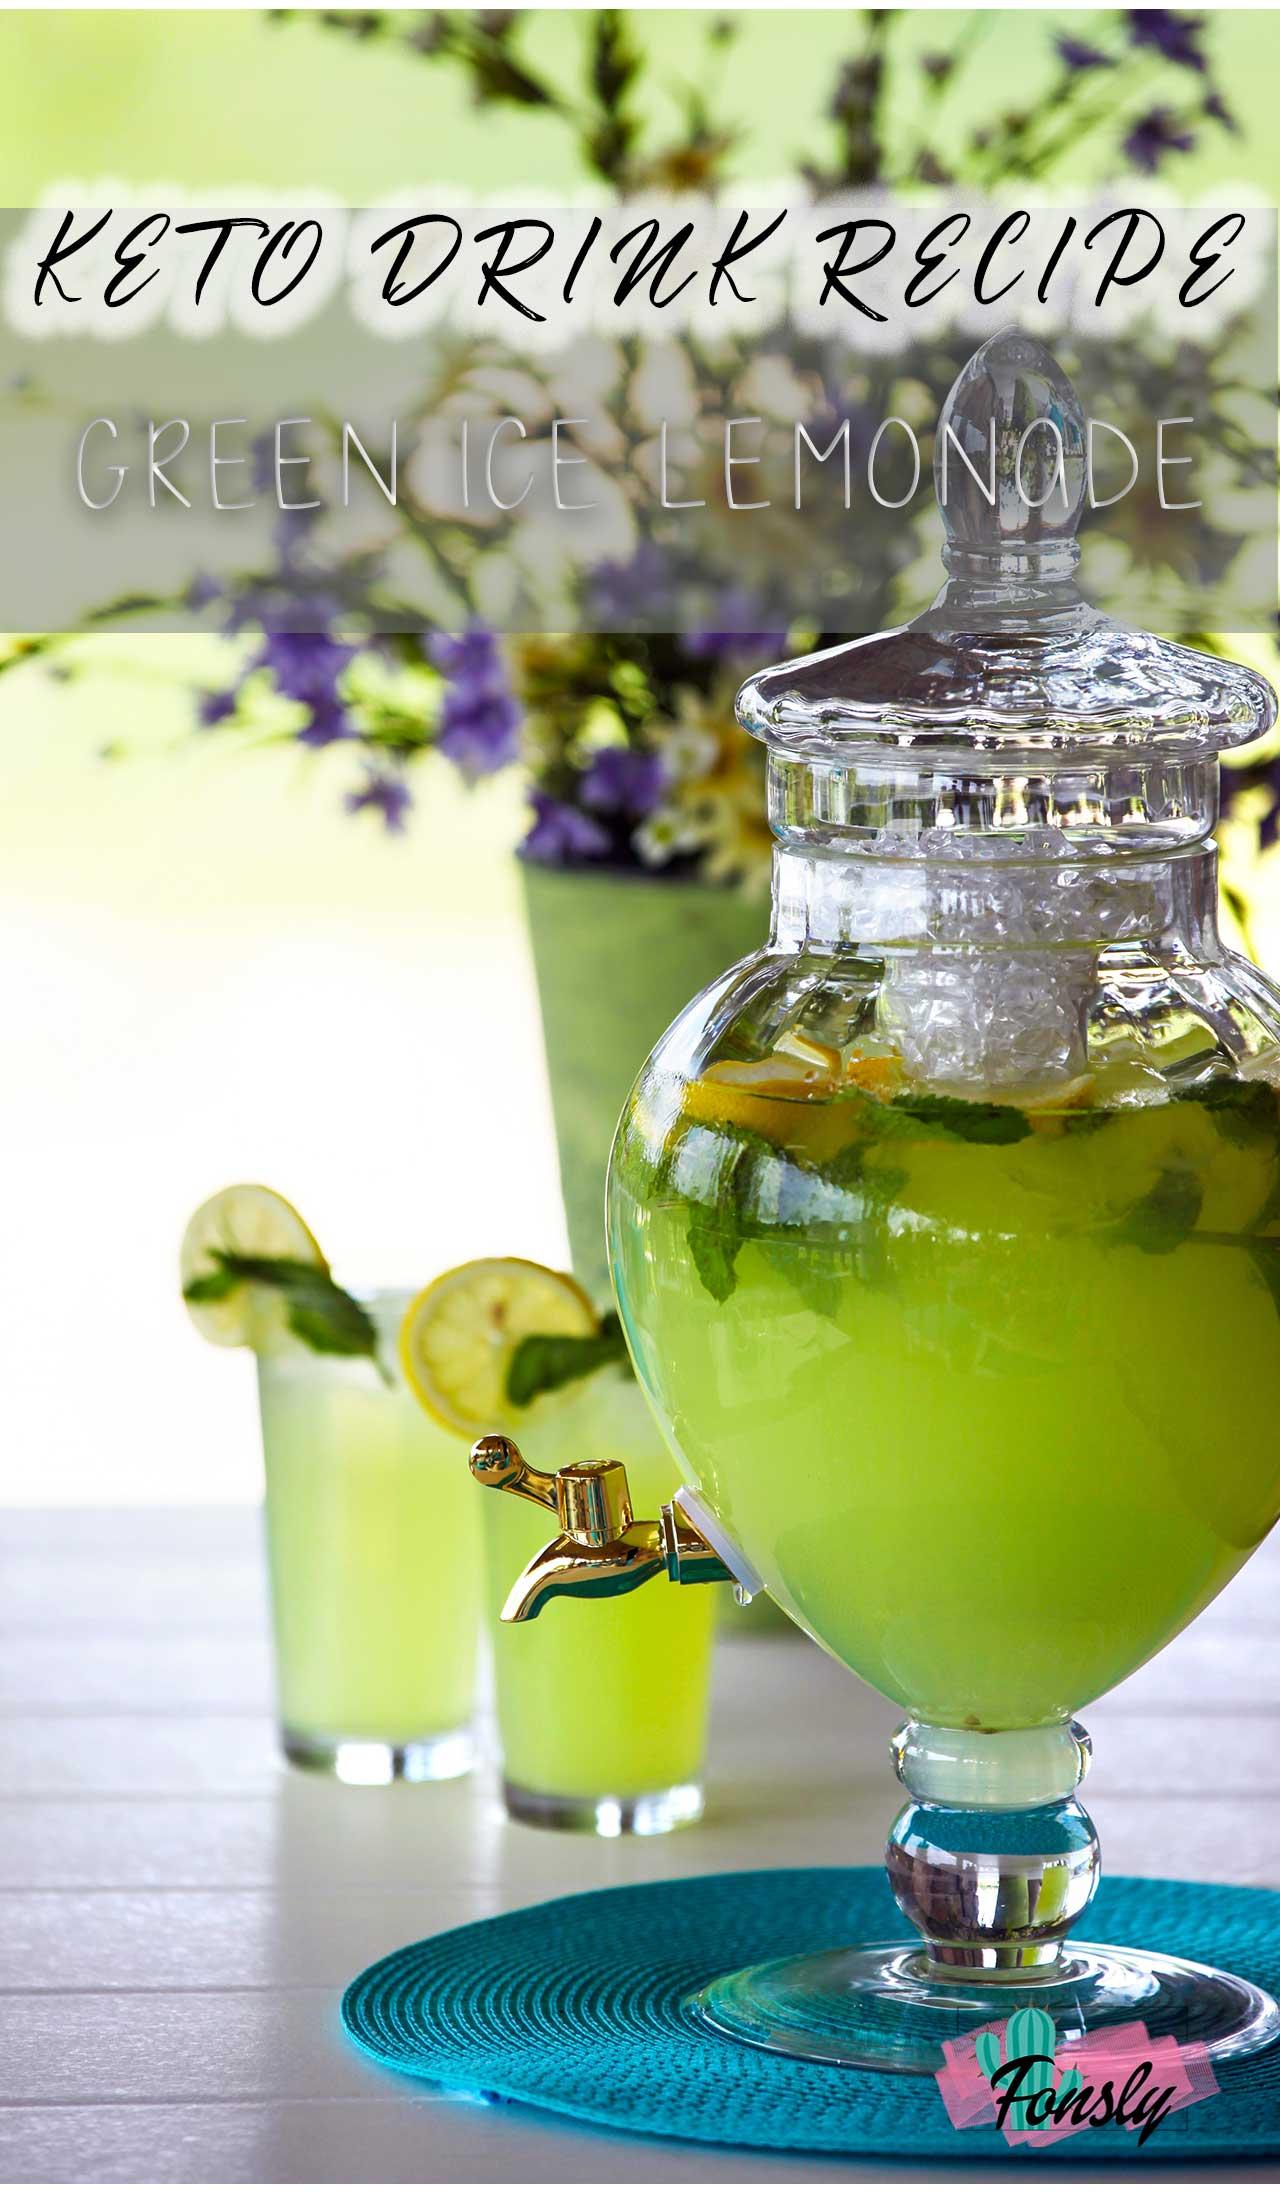 Keto Green Lemonade Ketogenic Diet Healthy Recipe Fonsly